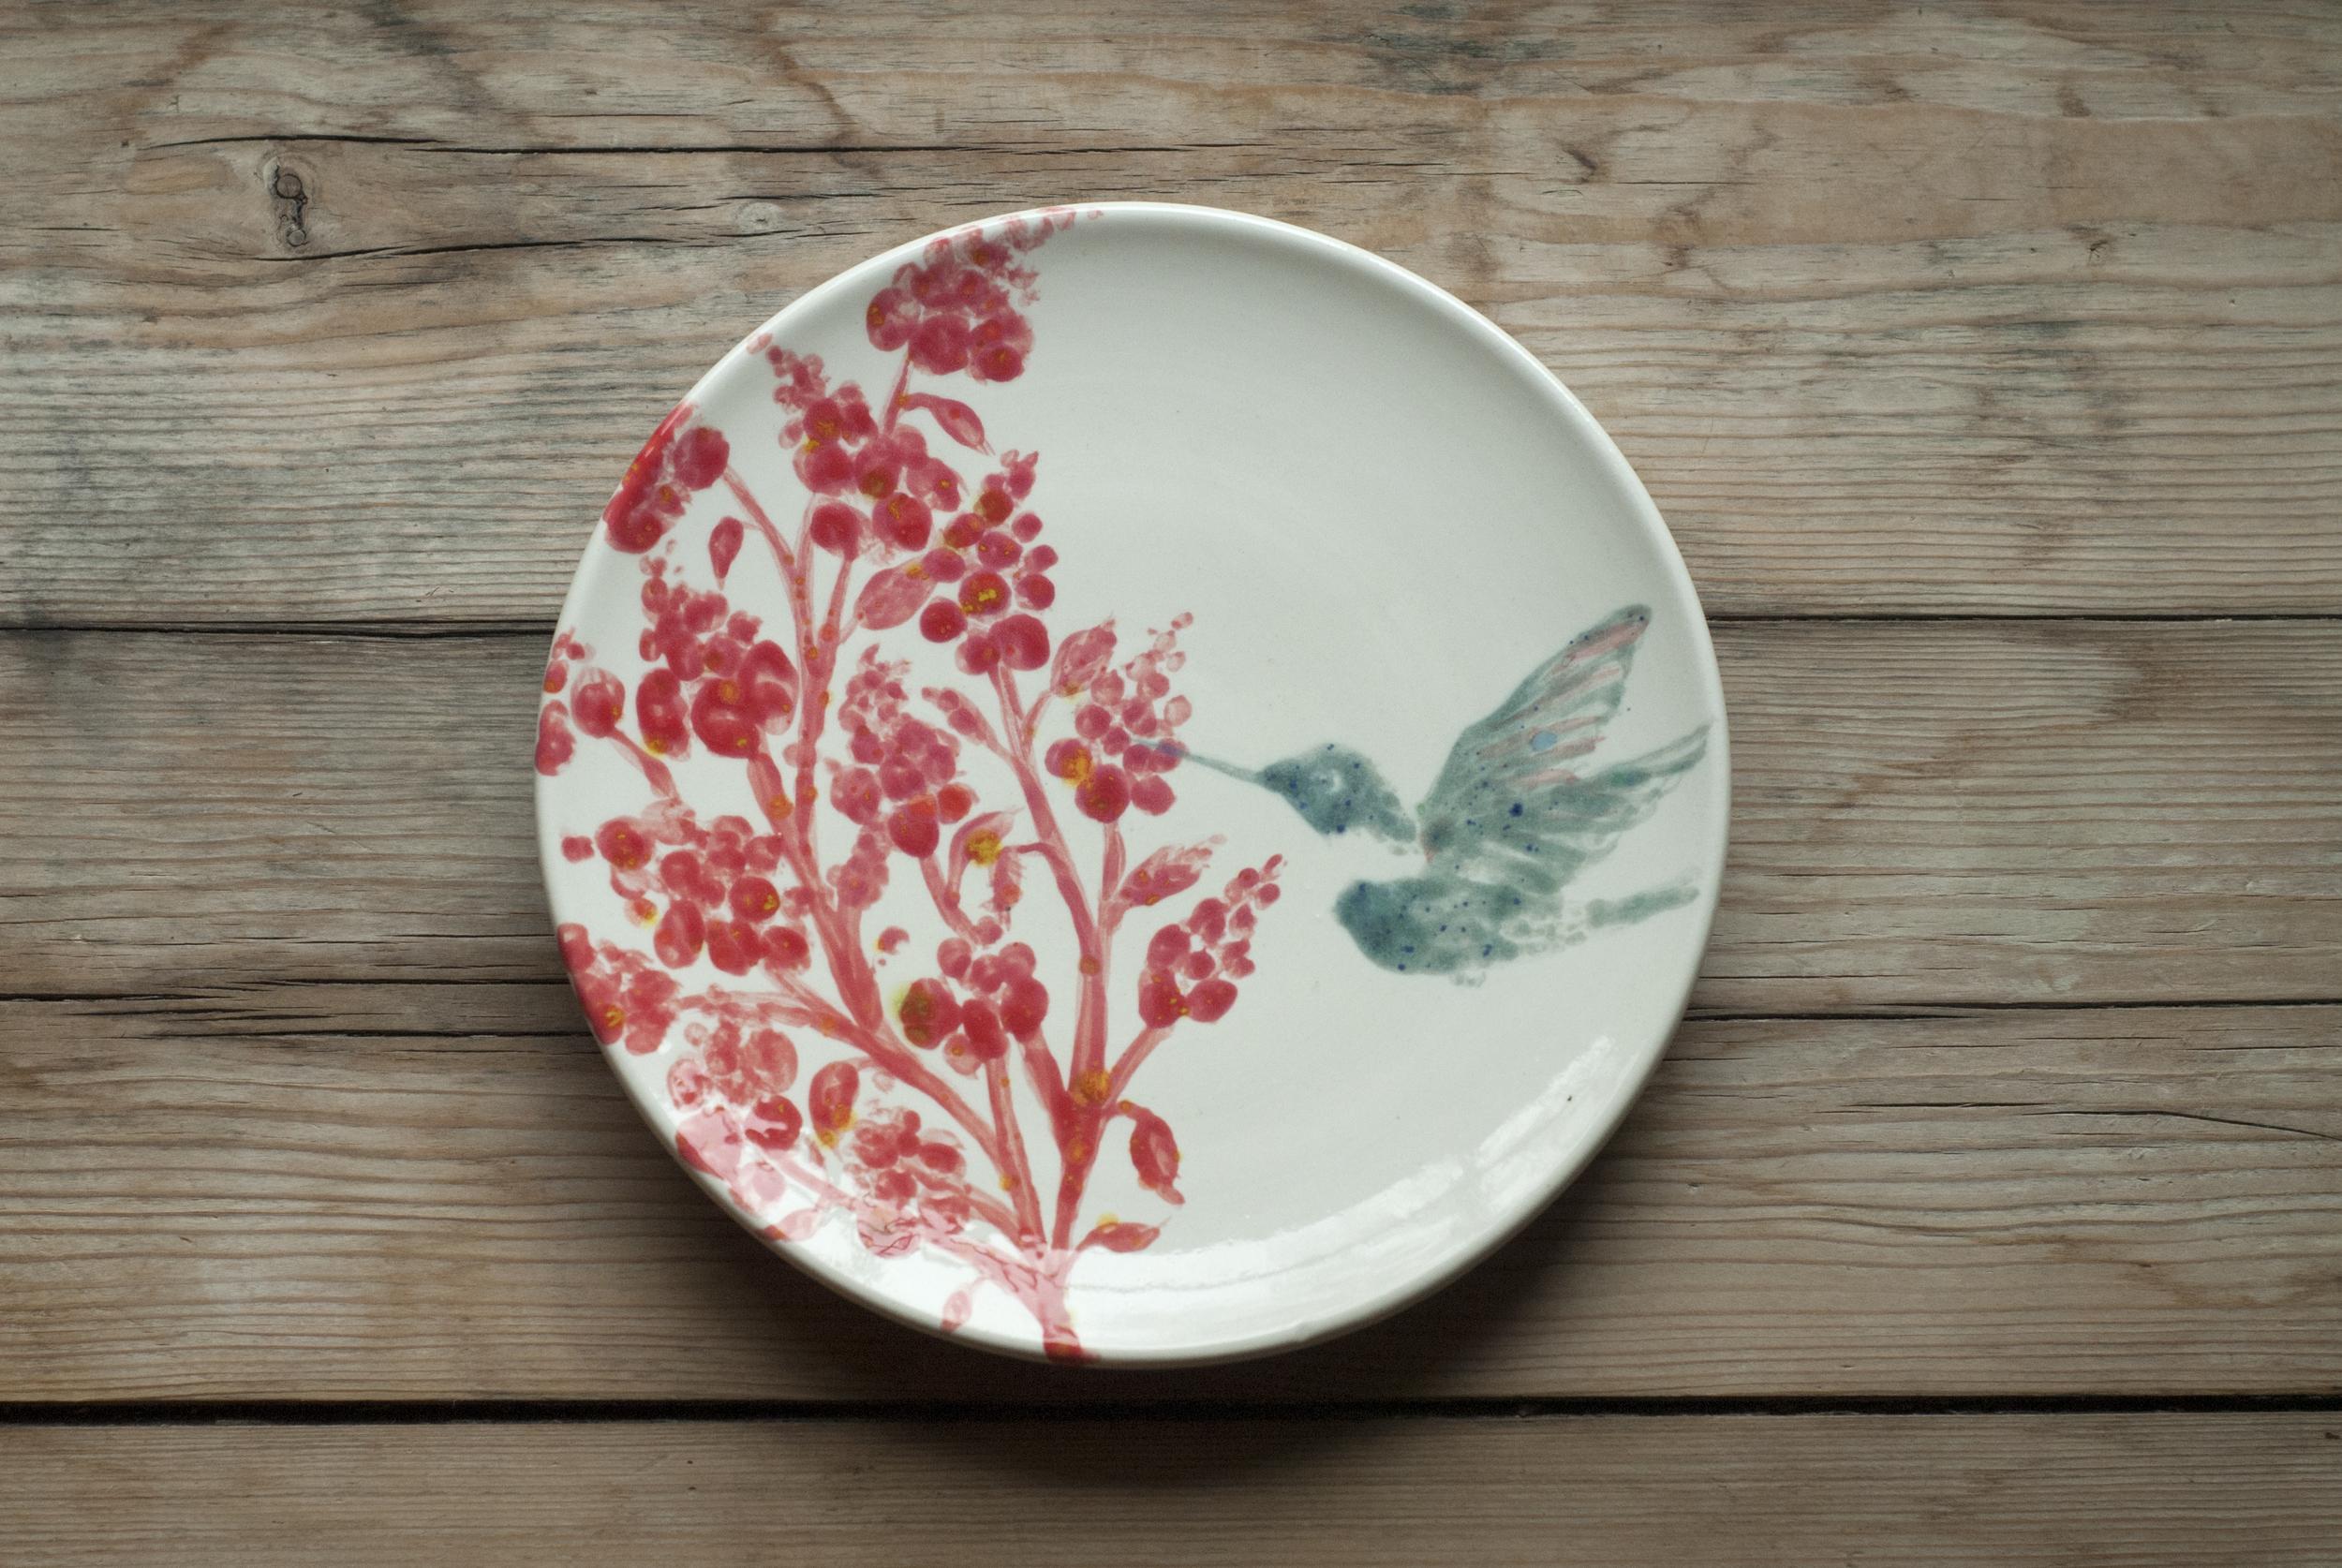 clarsson_amaranthandhummingbird_plate.jpg